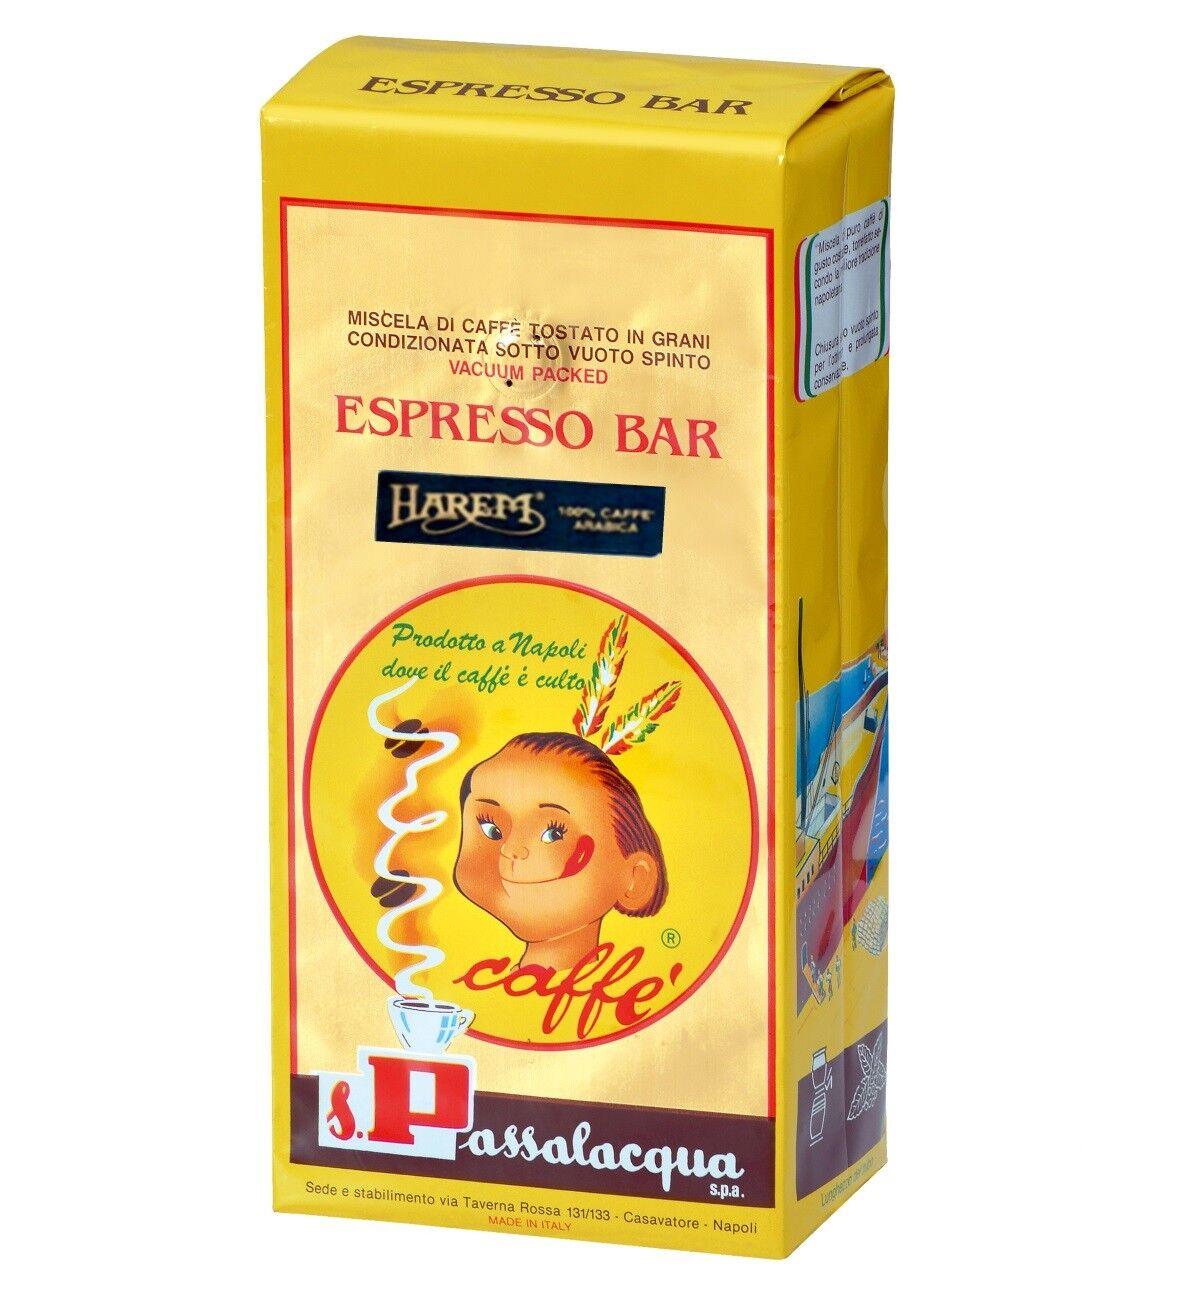 PASSALACQUA Harem 6 X 1 KG Bohnen im Beutel